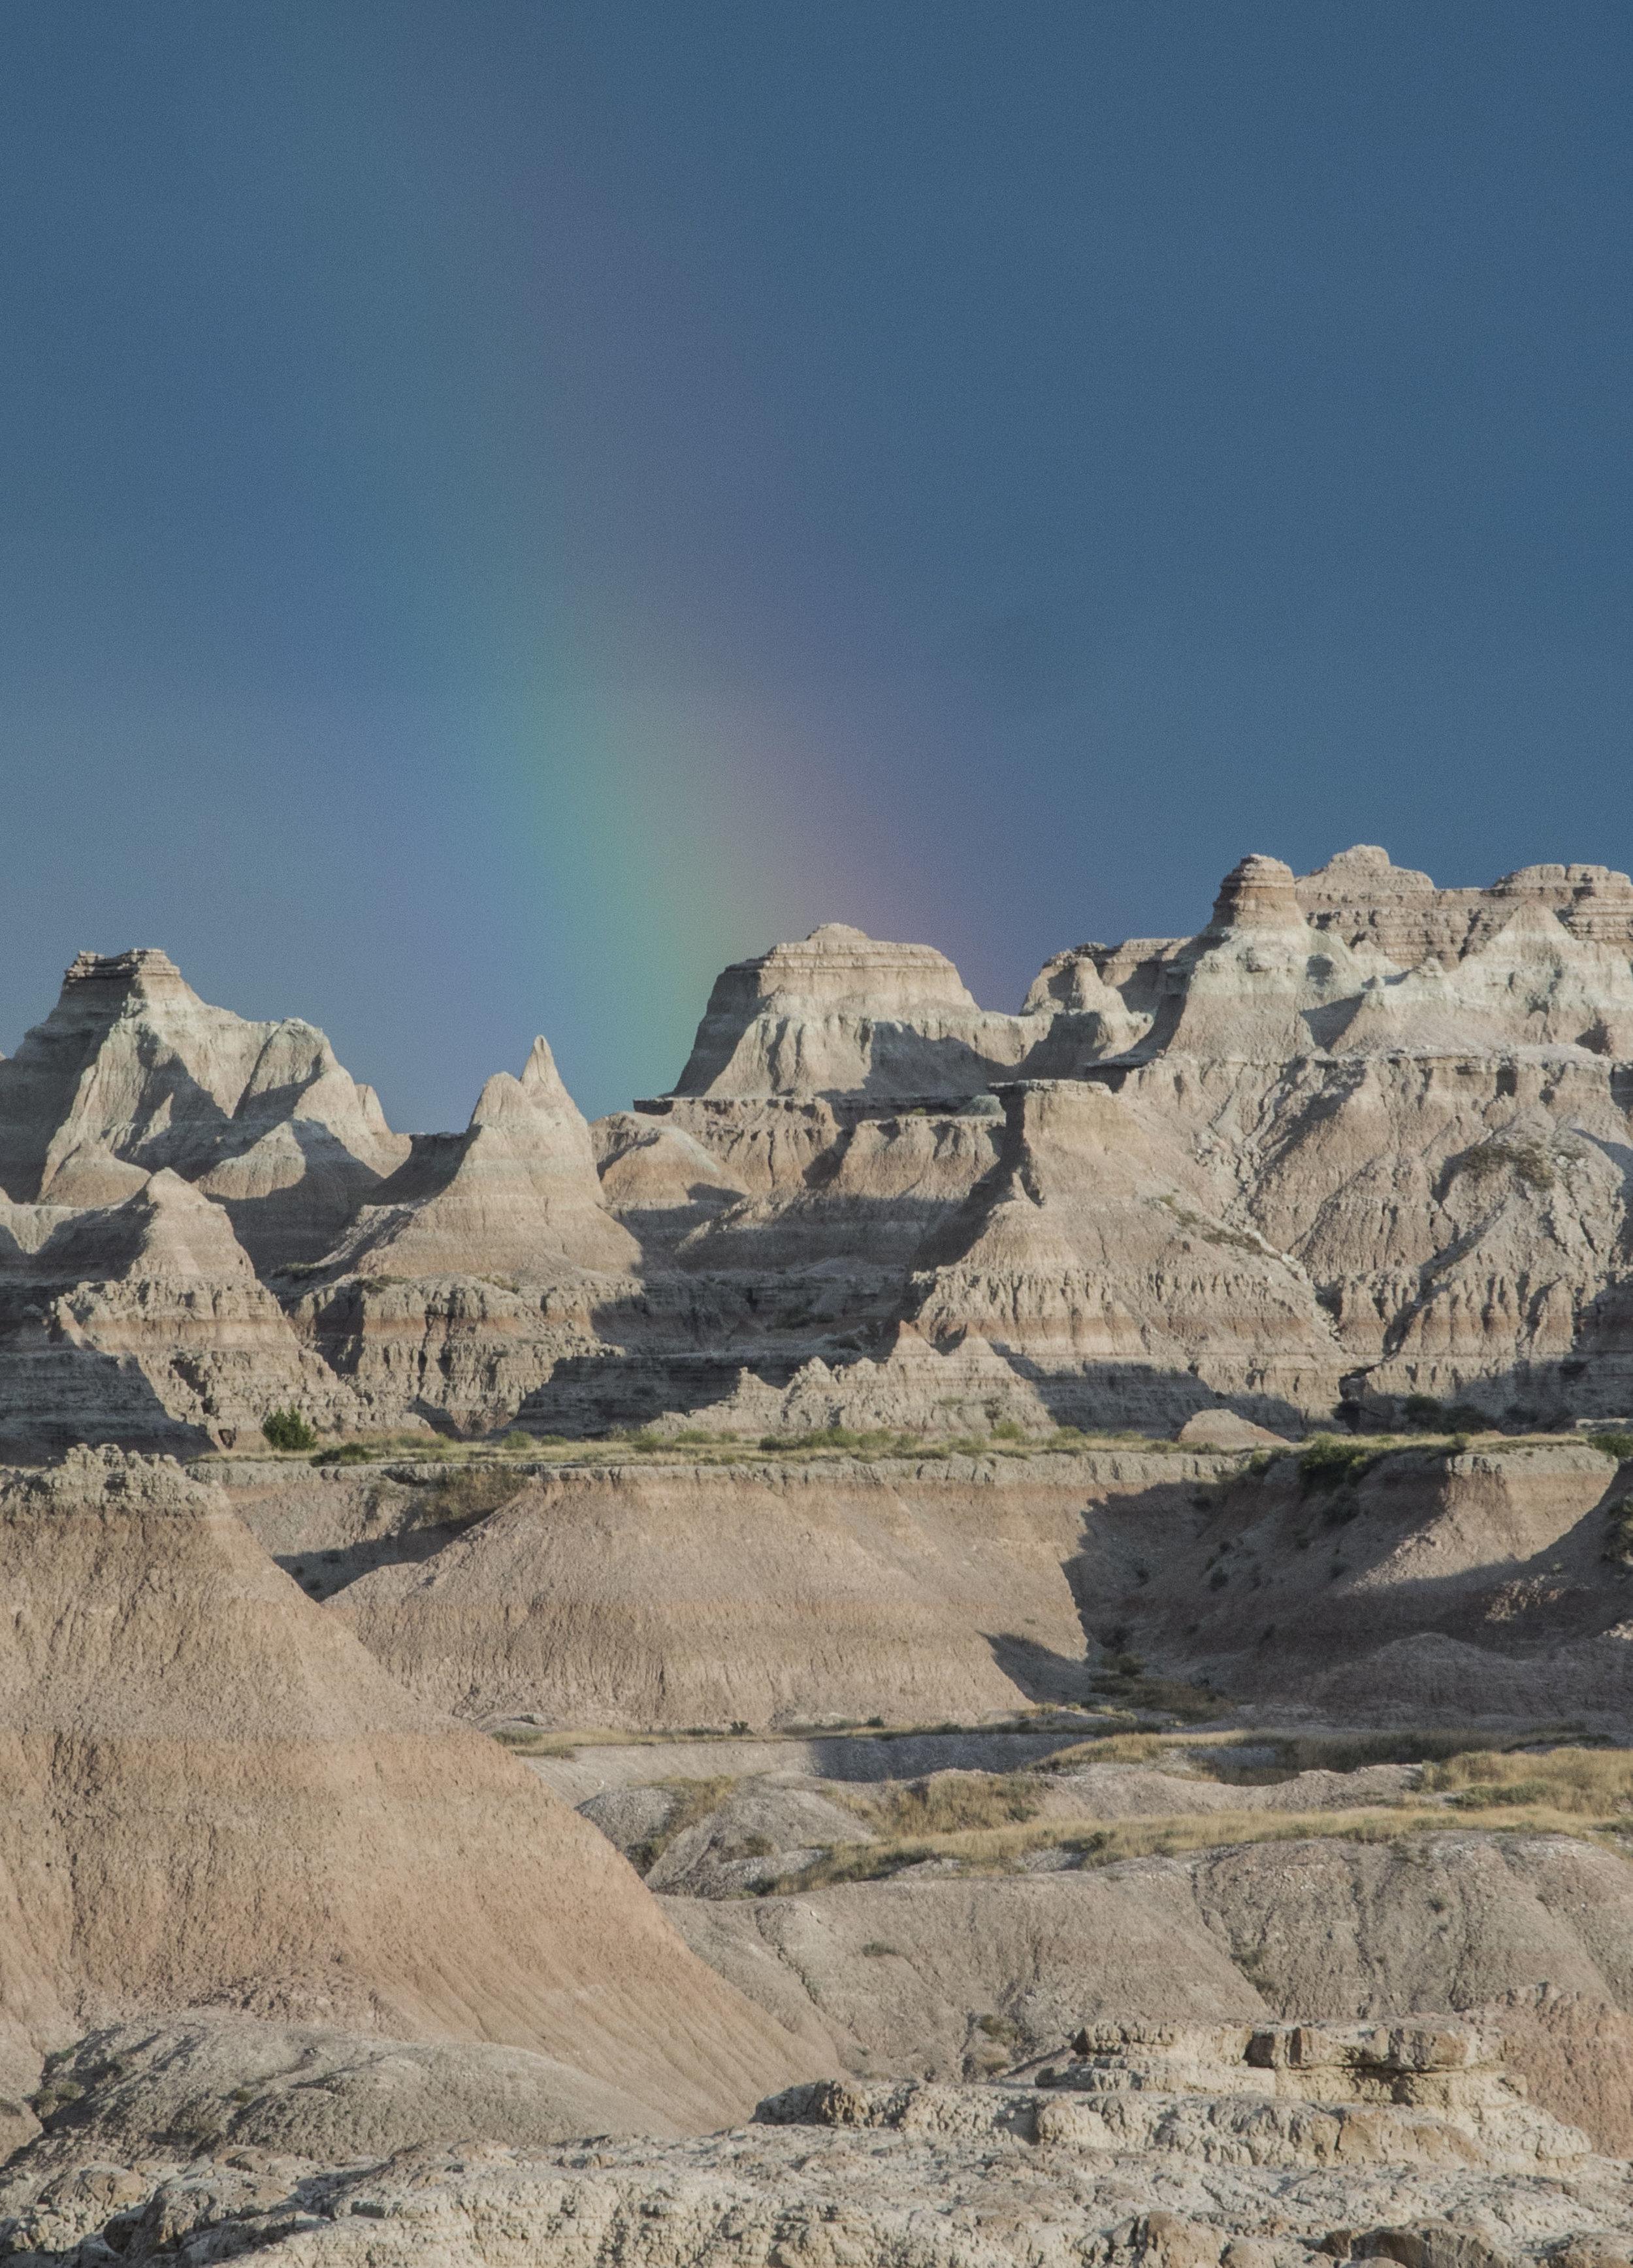 A rainbow precedes an evening thunderstorm in Badlands National Park, South Dakota in August 2016. (Megan Perra)